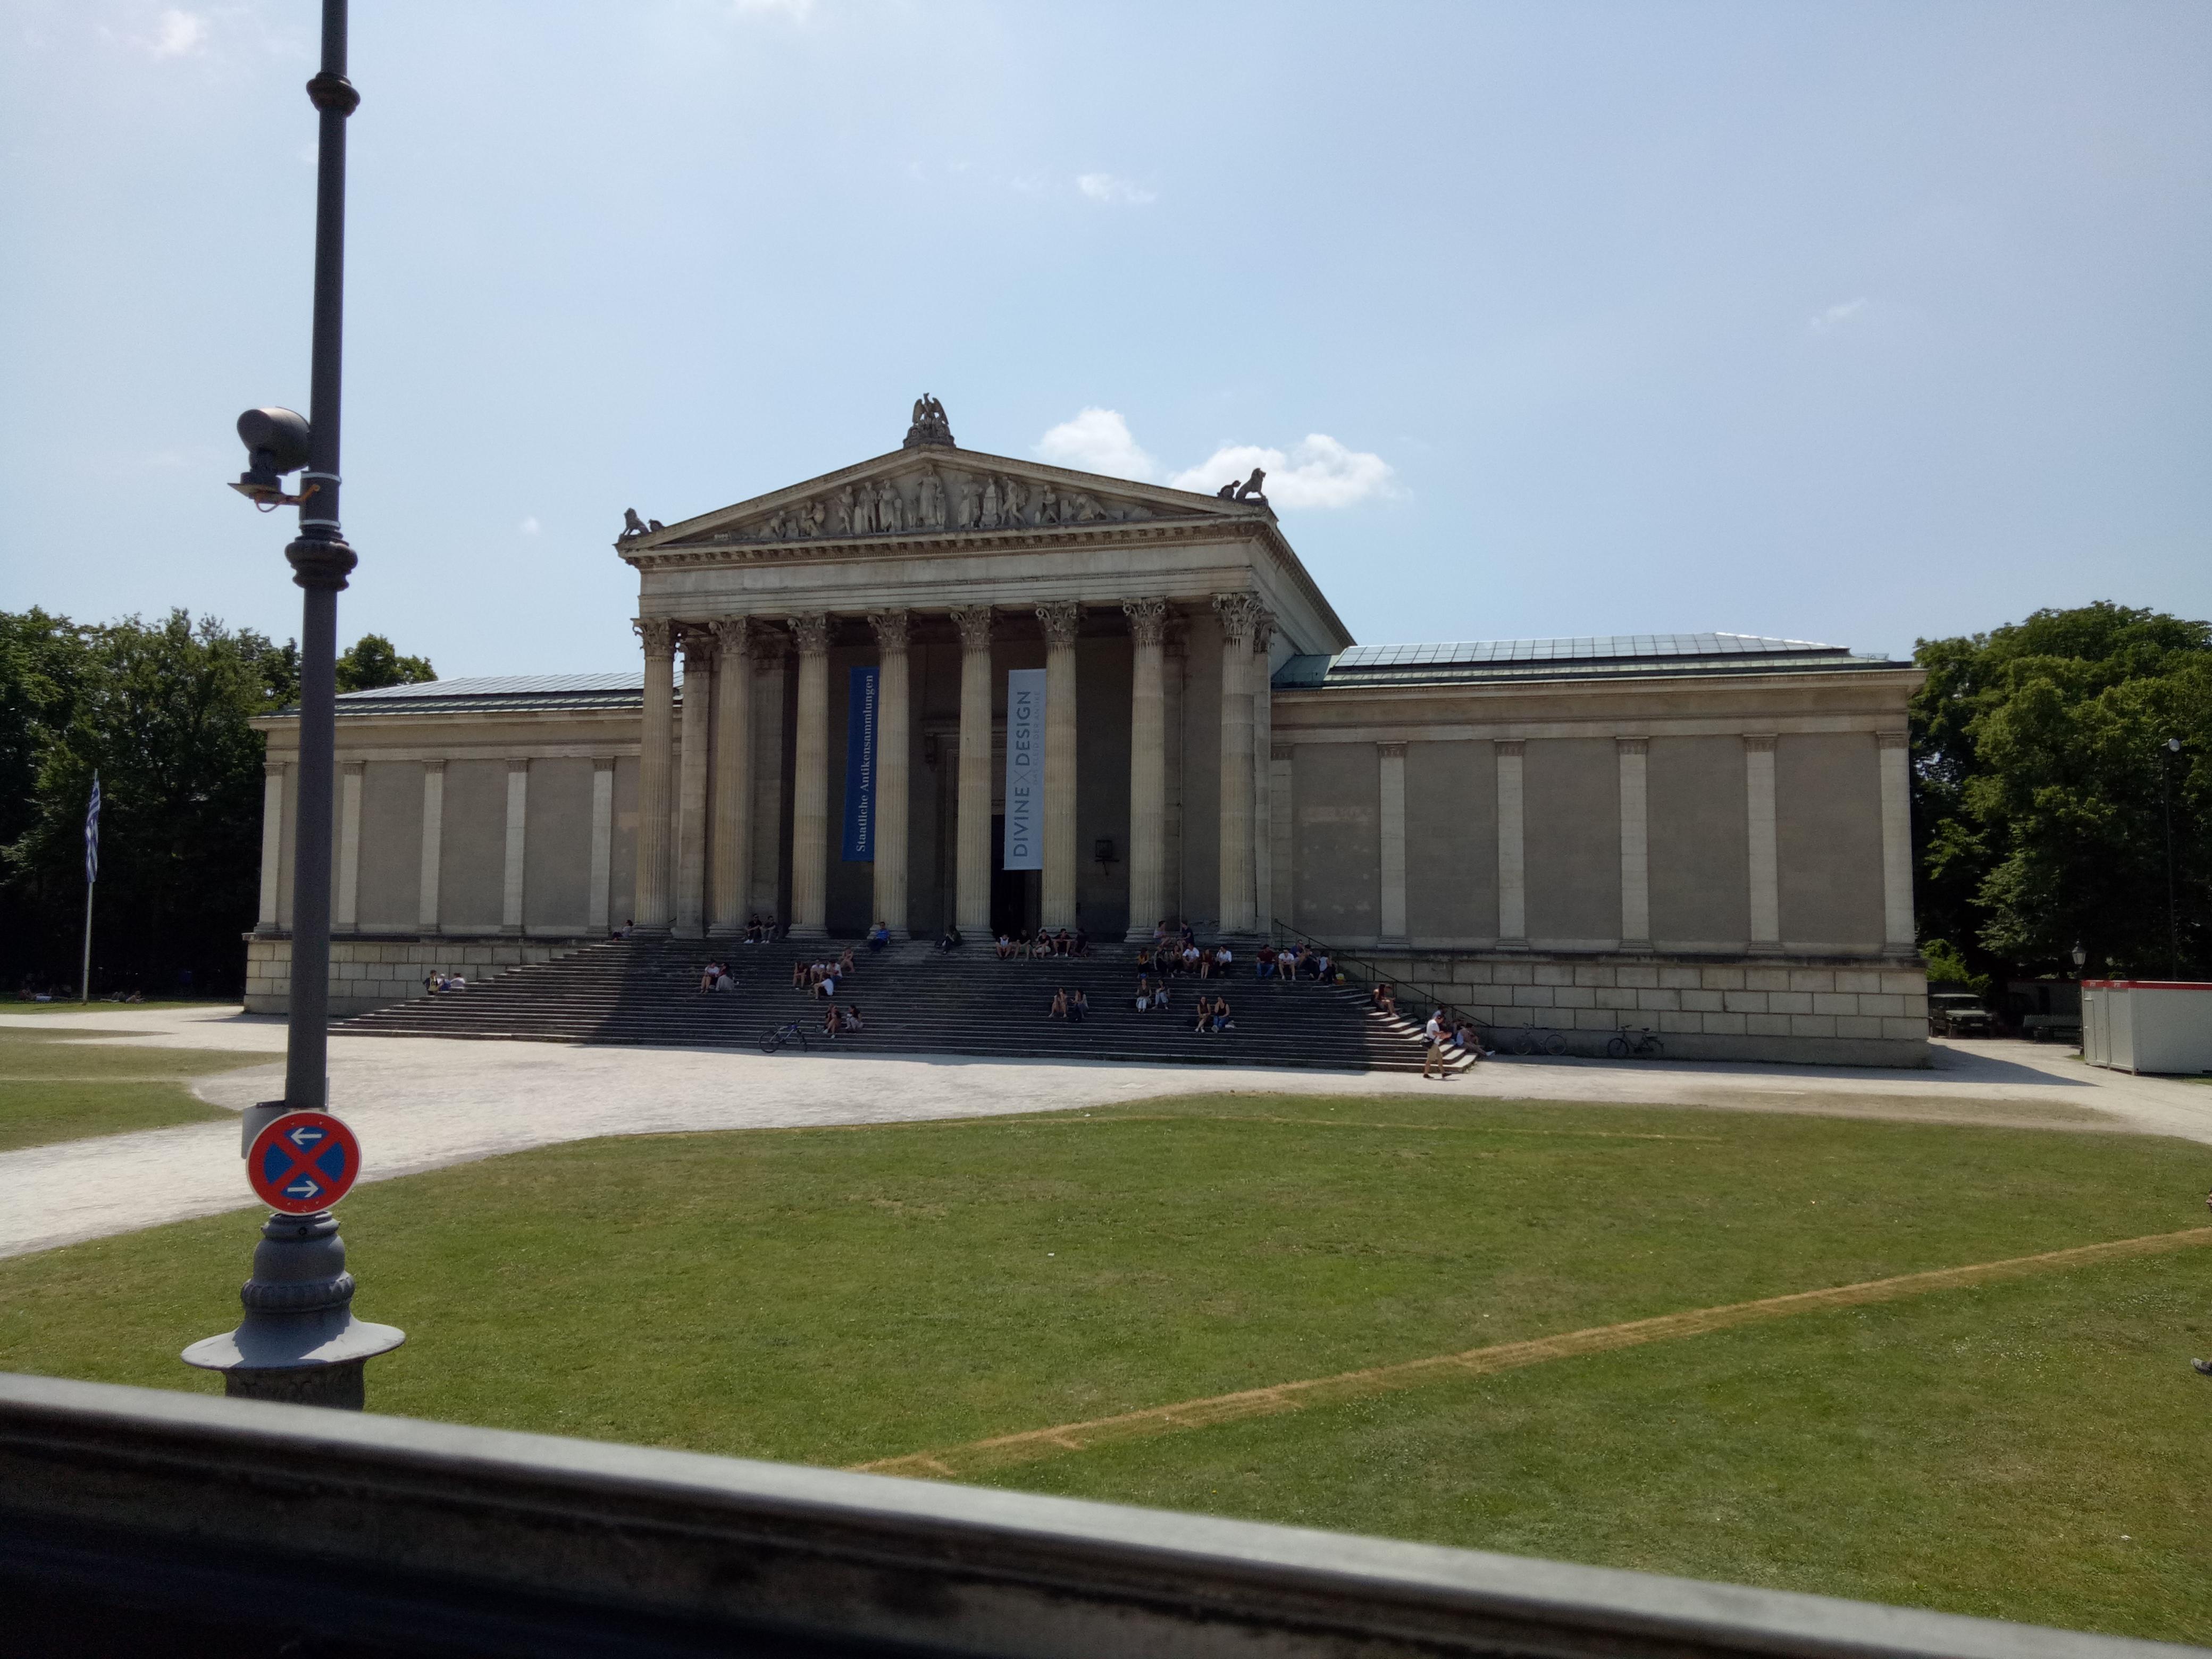 Munich tourist spots